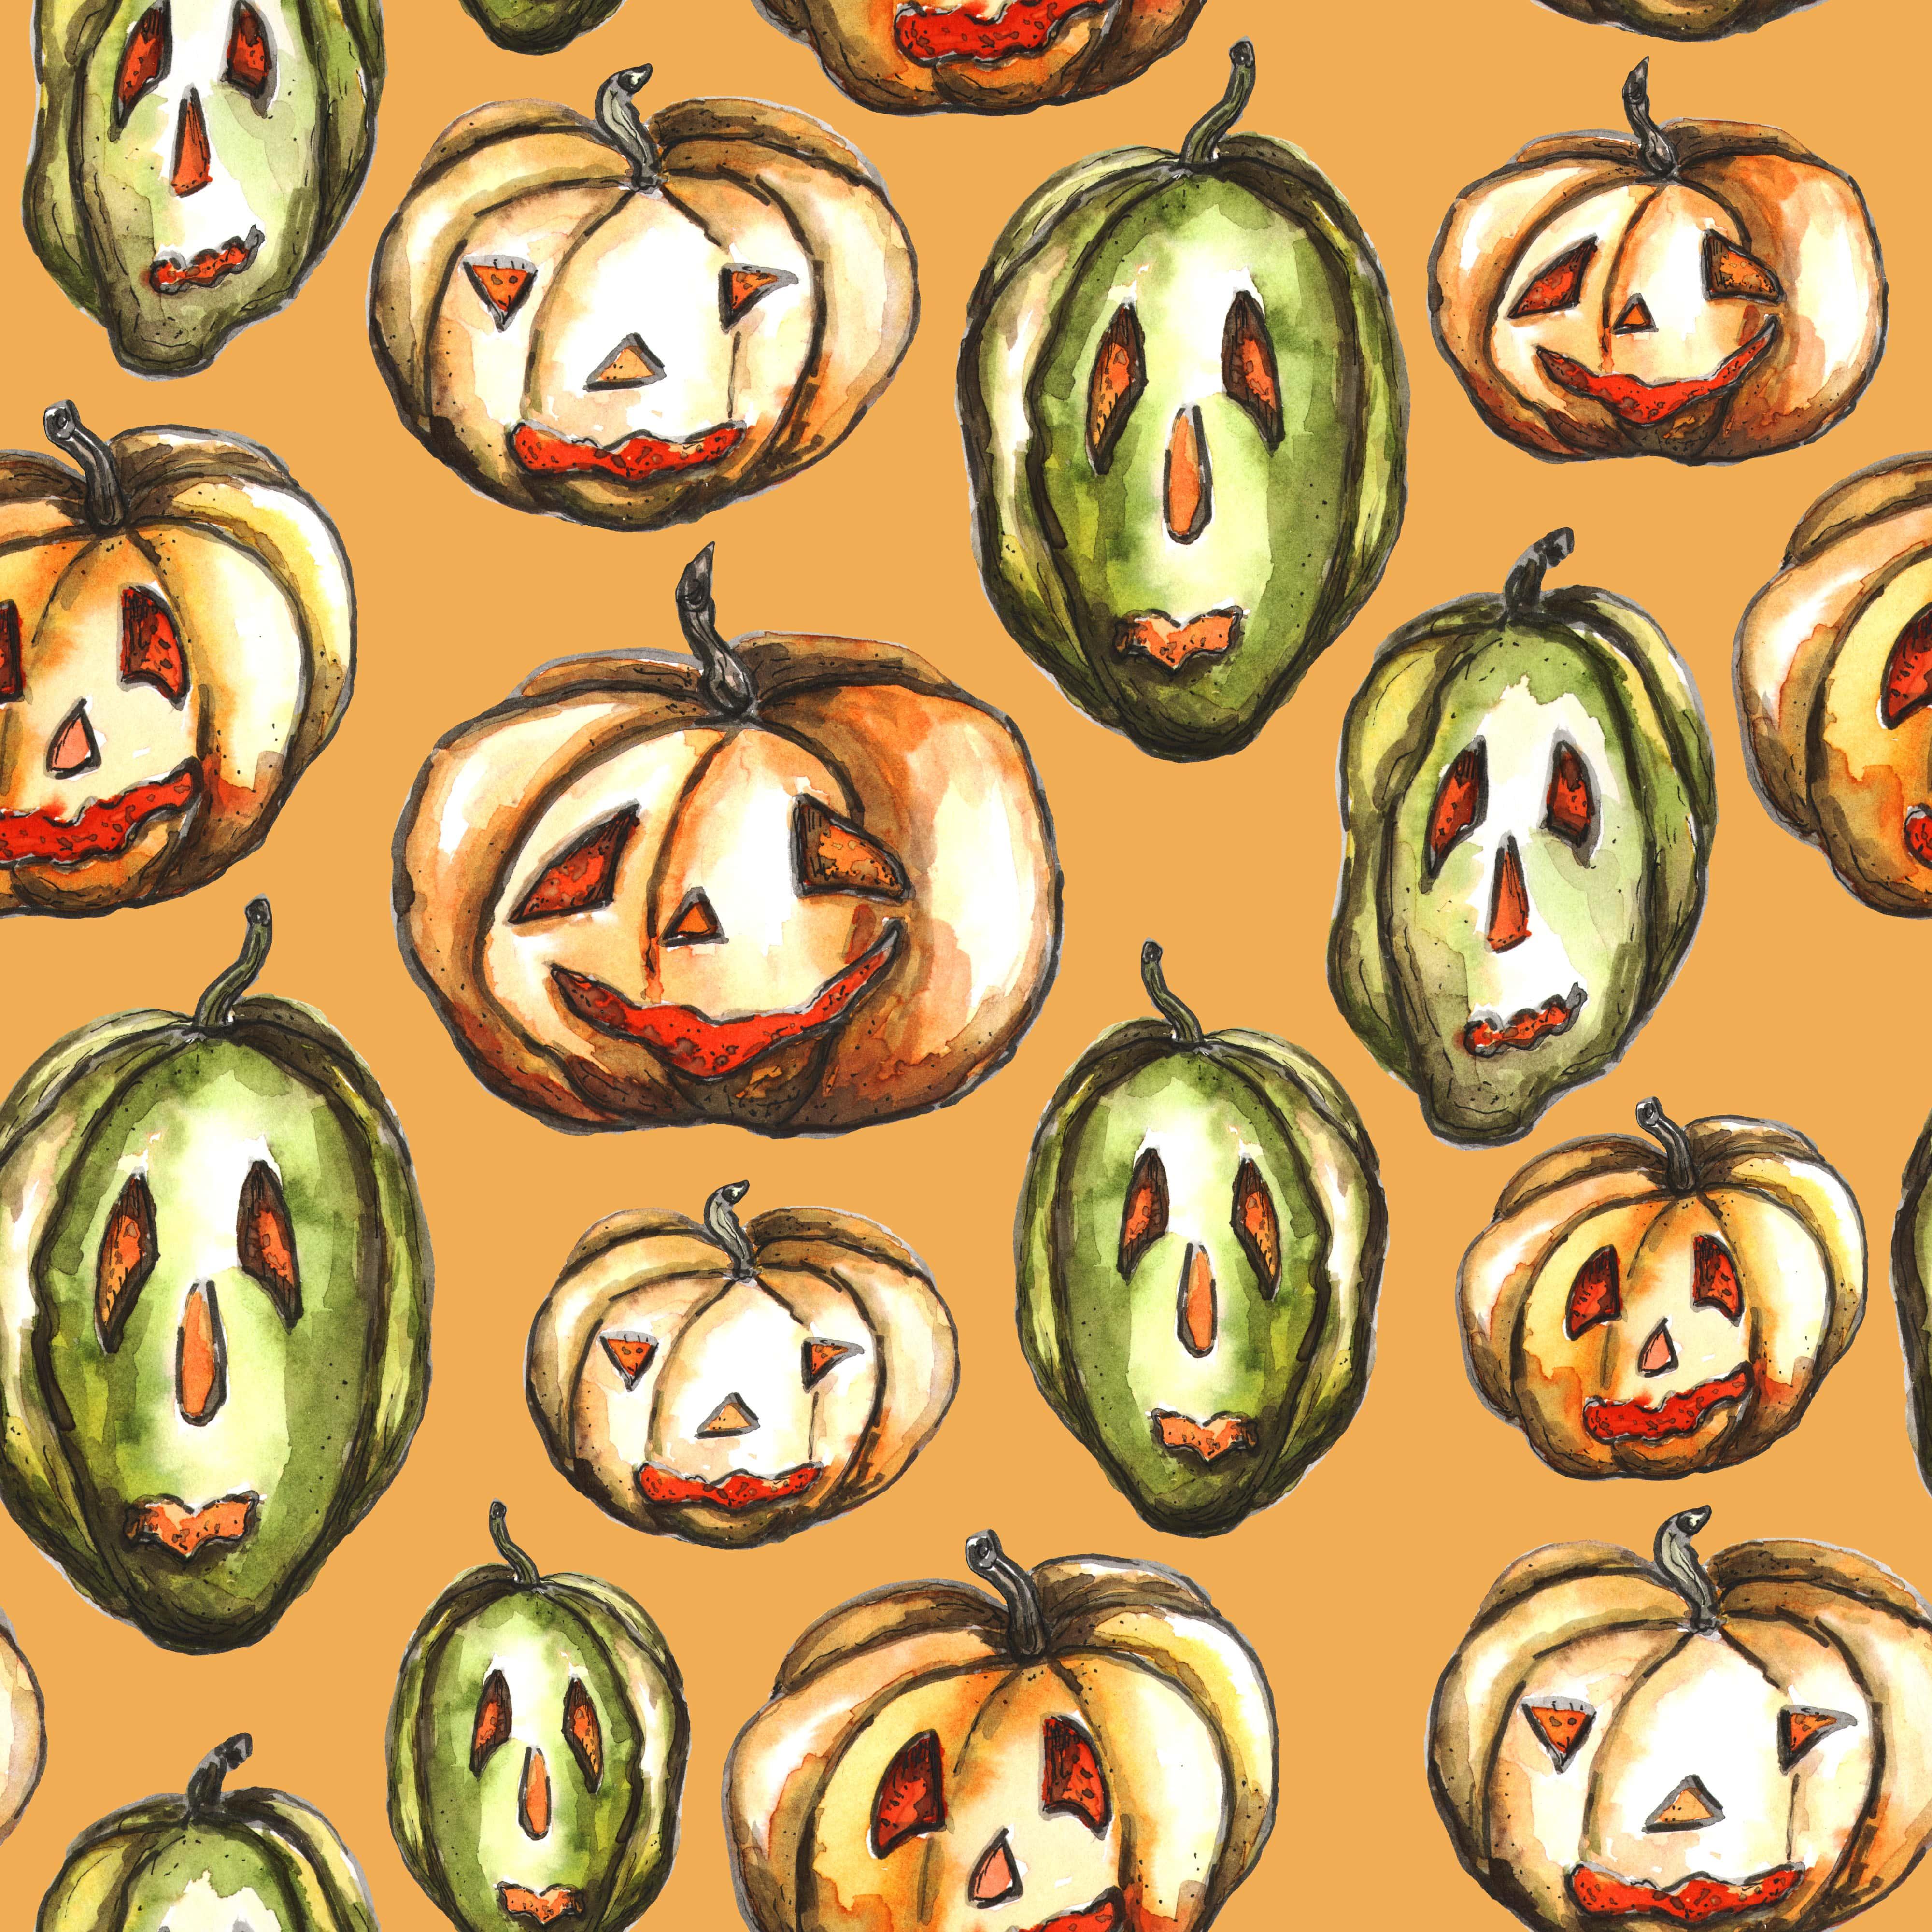 10+ Best Halloween Patterns in 2020:  11 Patterns - just $7 - pattern6 min